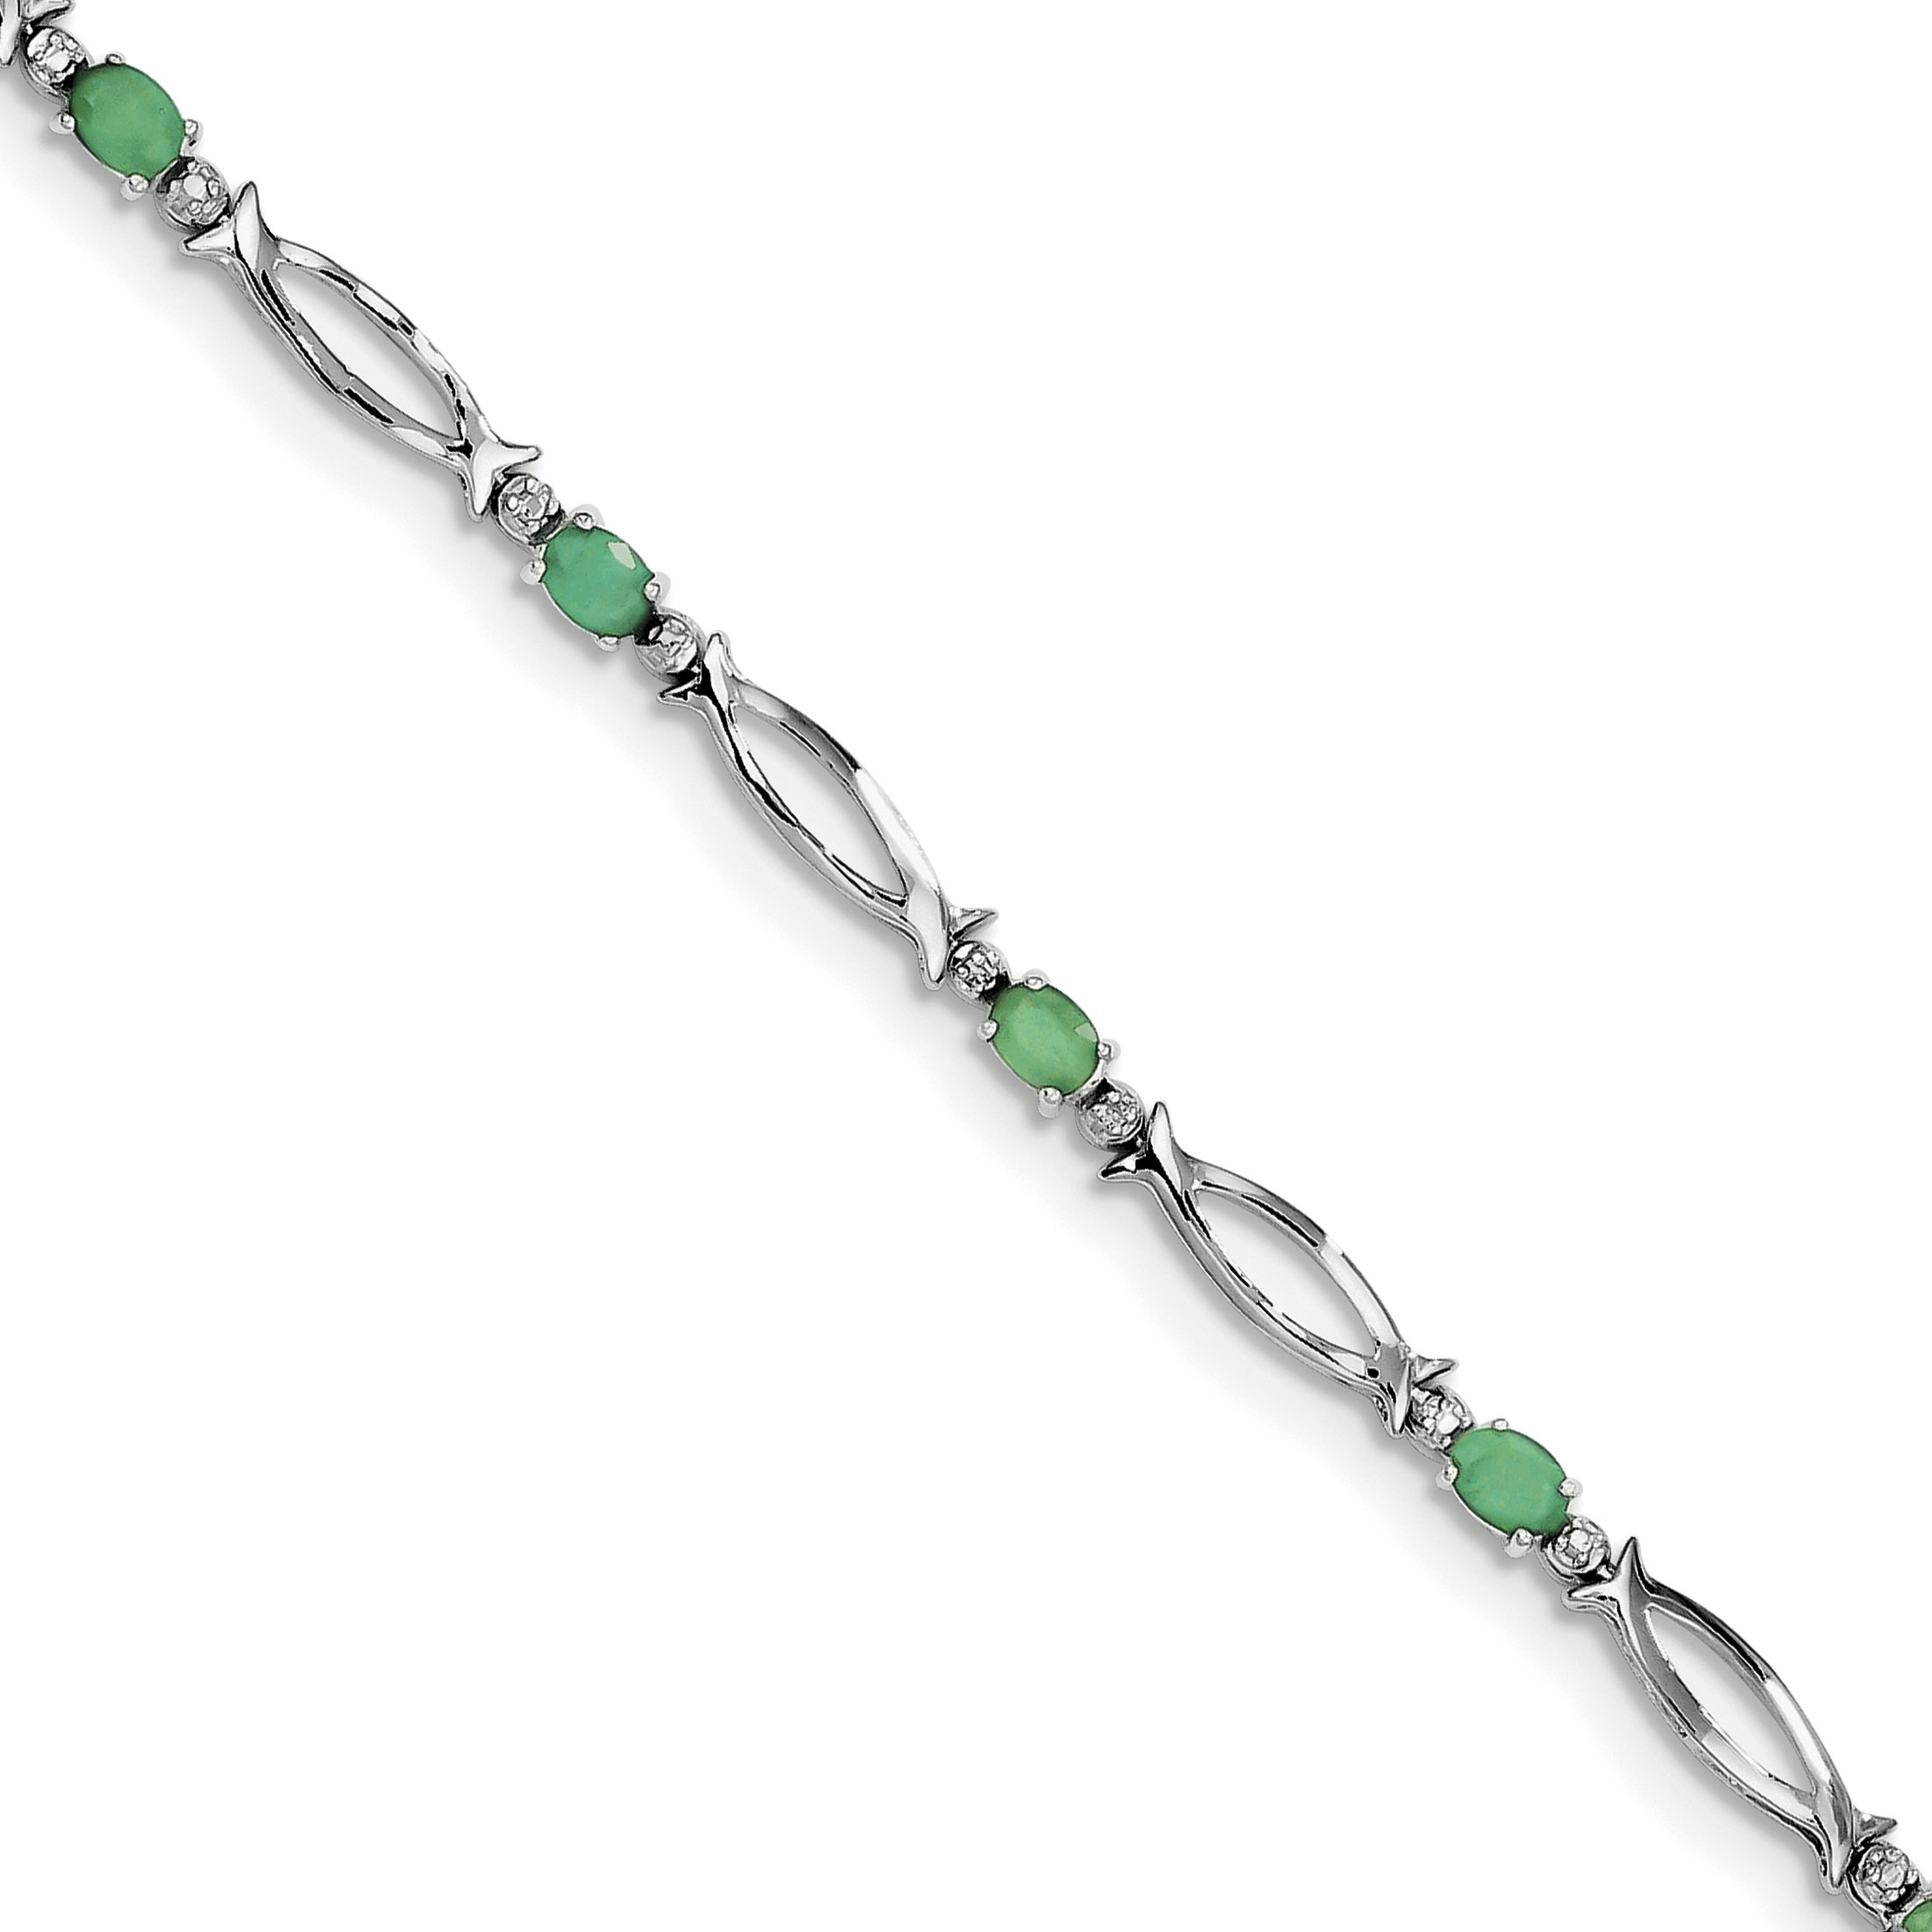 ICE CARATS 925 Sterling Silver Green Emerald Diamond Bracelet 7 Inch Gemstone Fine Jewelry Gift Set For Women Heart